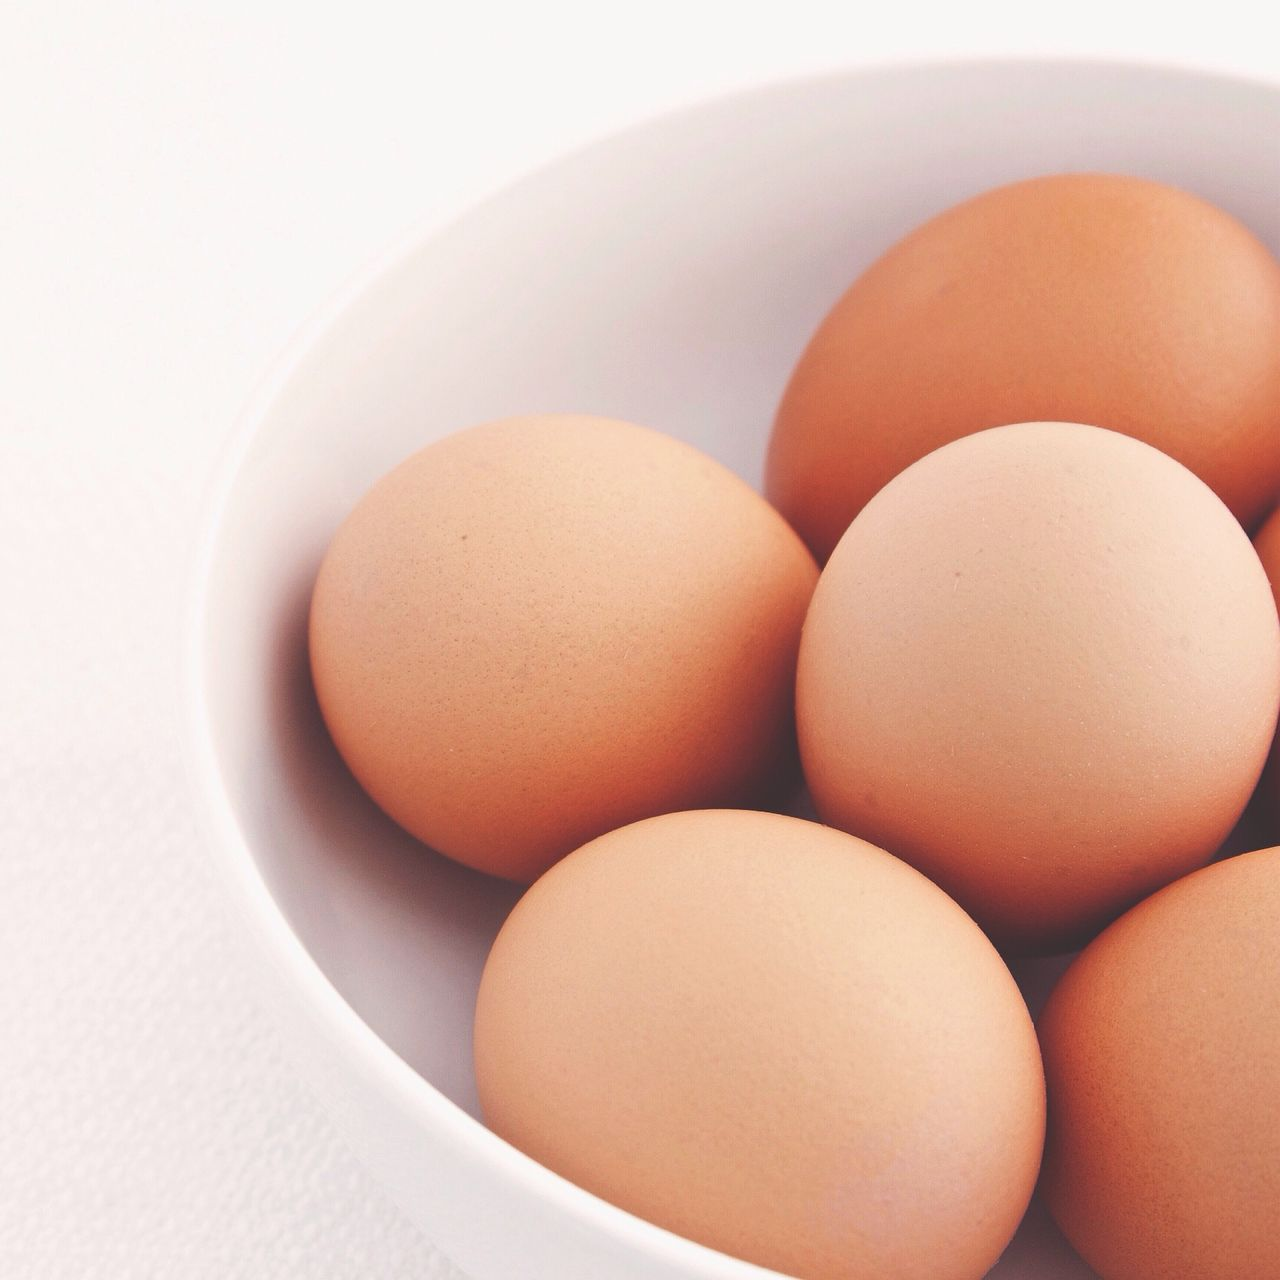 Fresh Eggs In Bowl